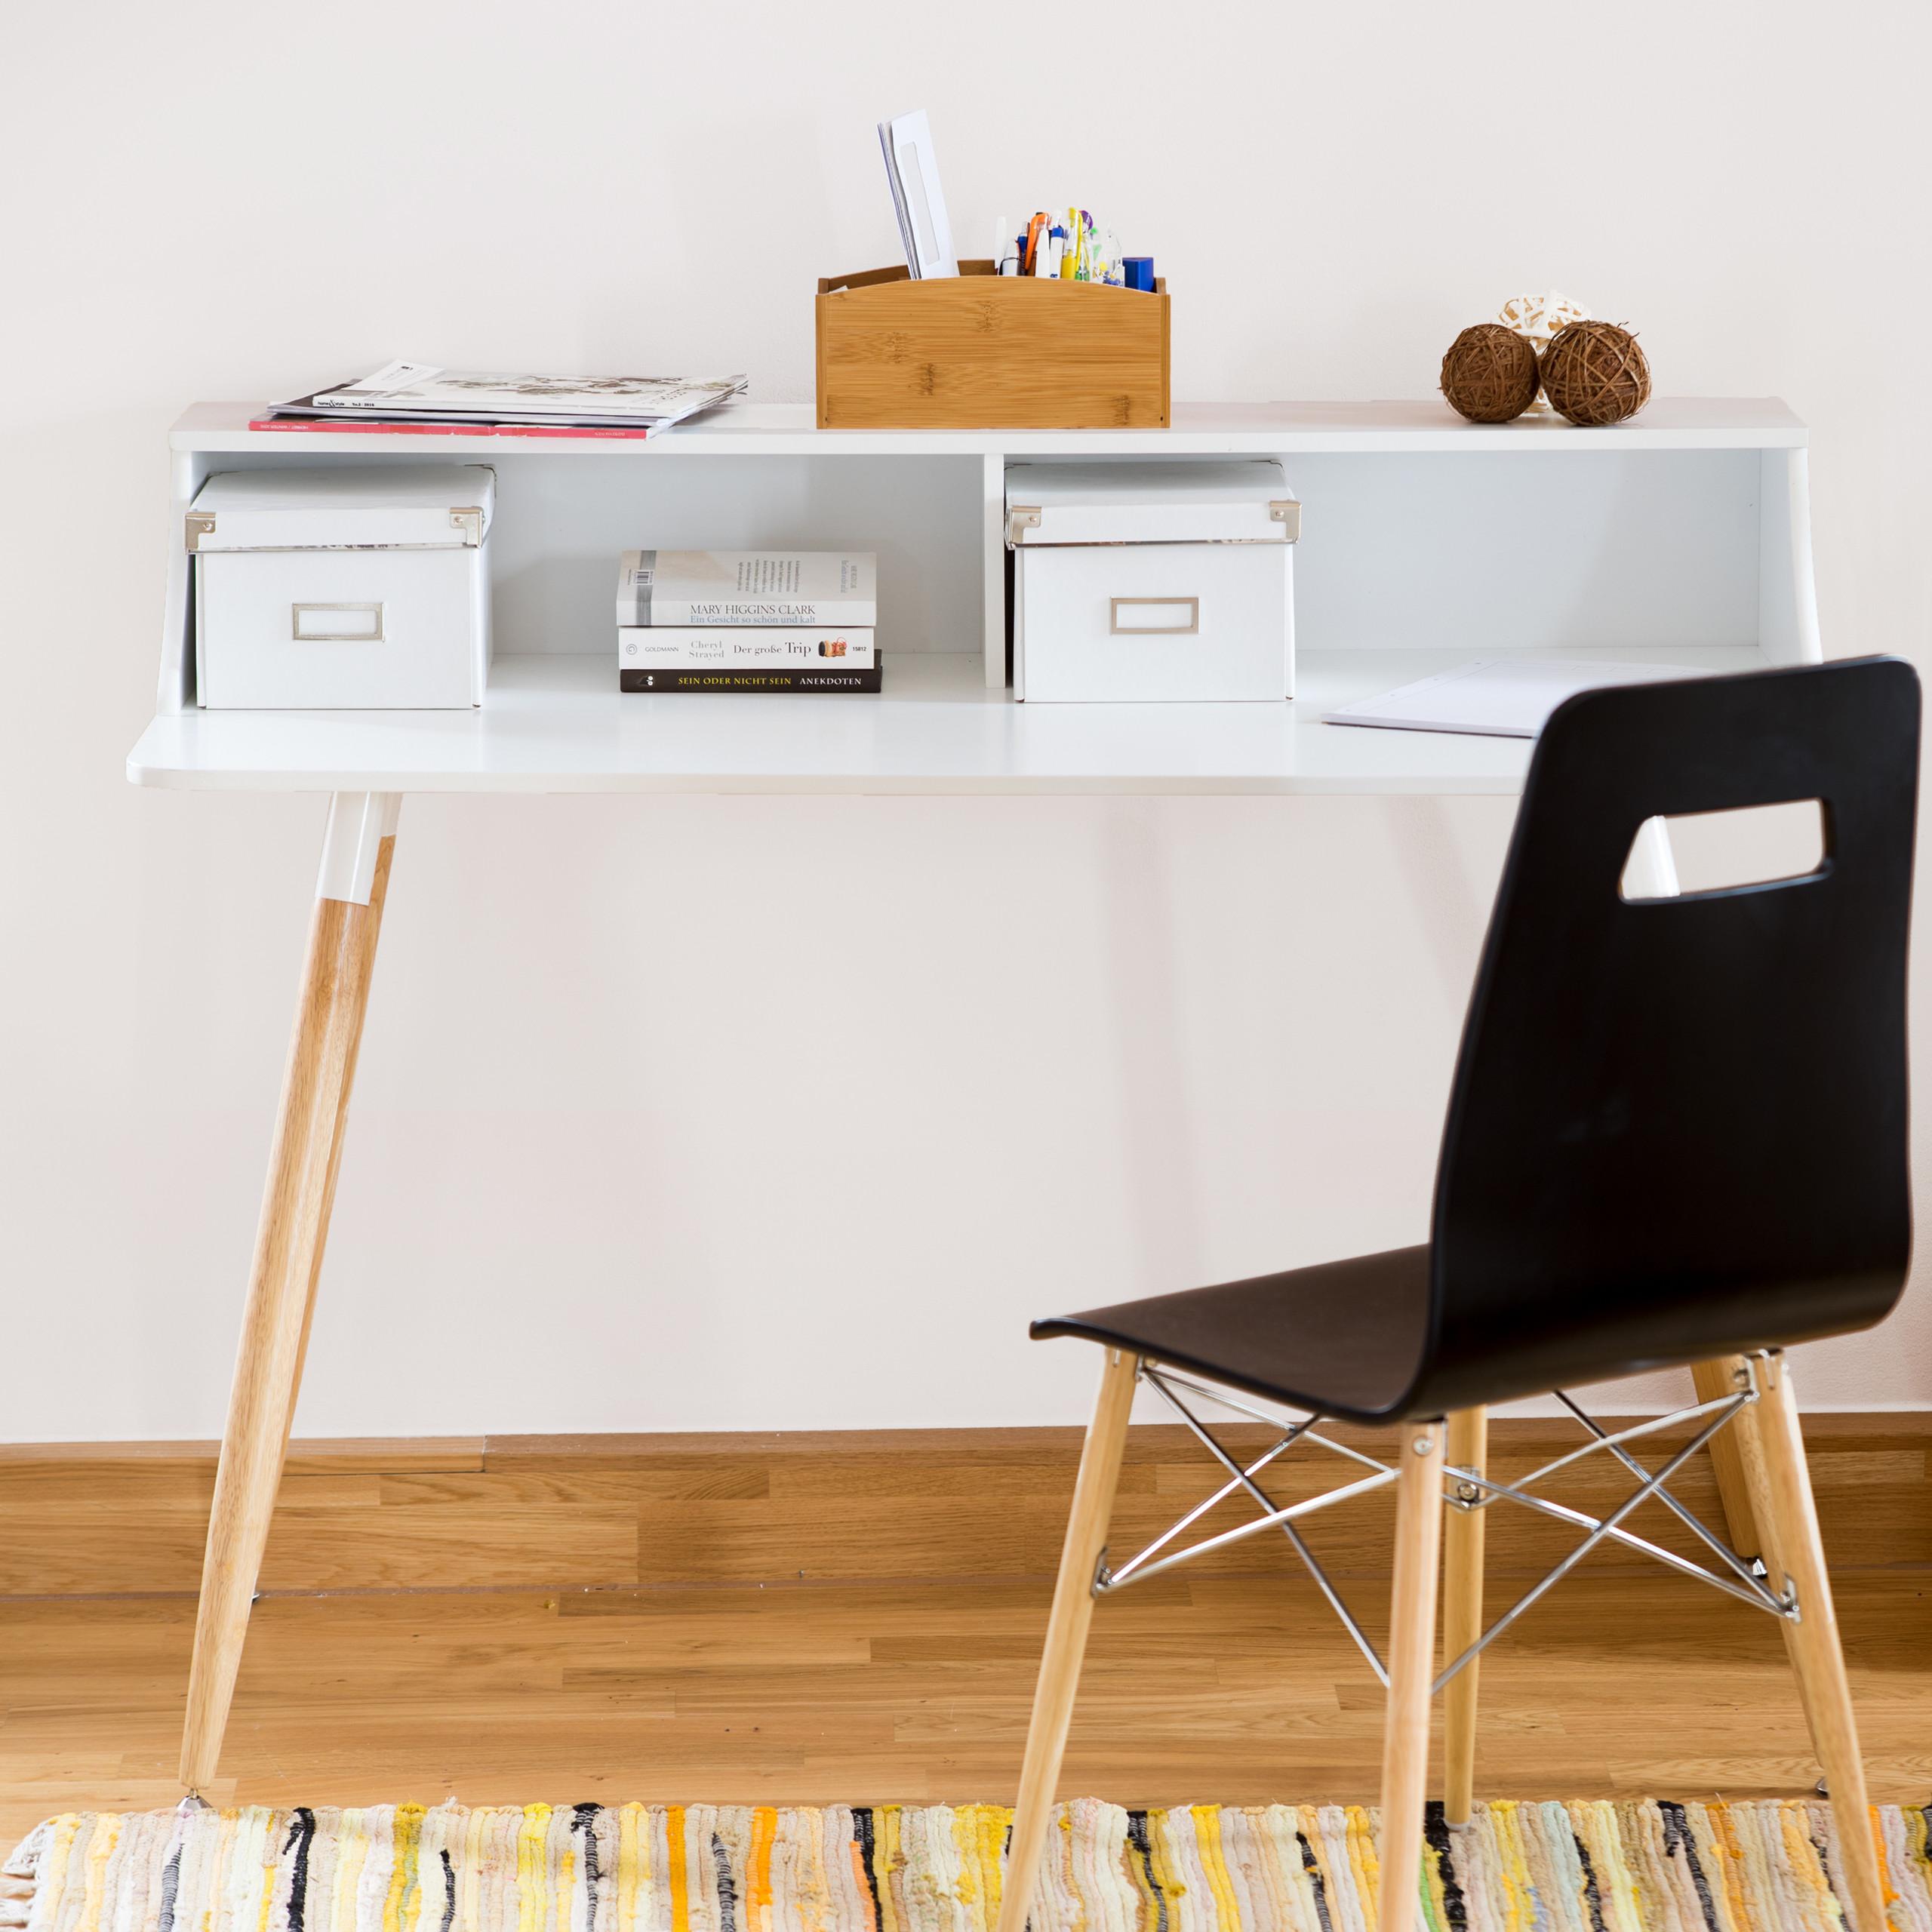 bureau-kinderbureau-ruimtebesparend-75-cm-hoog-laptoptafel-120-breed miniatuur 16